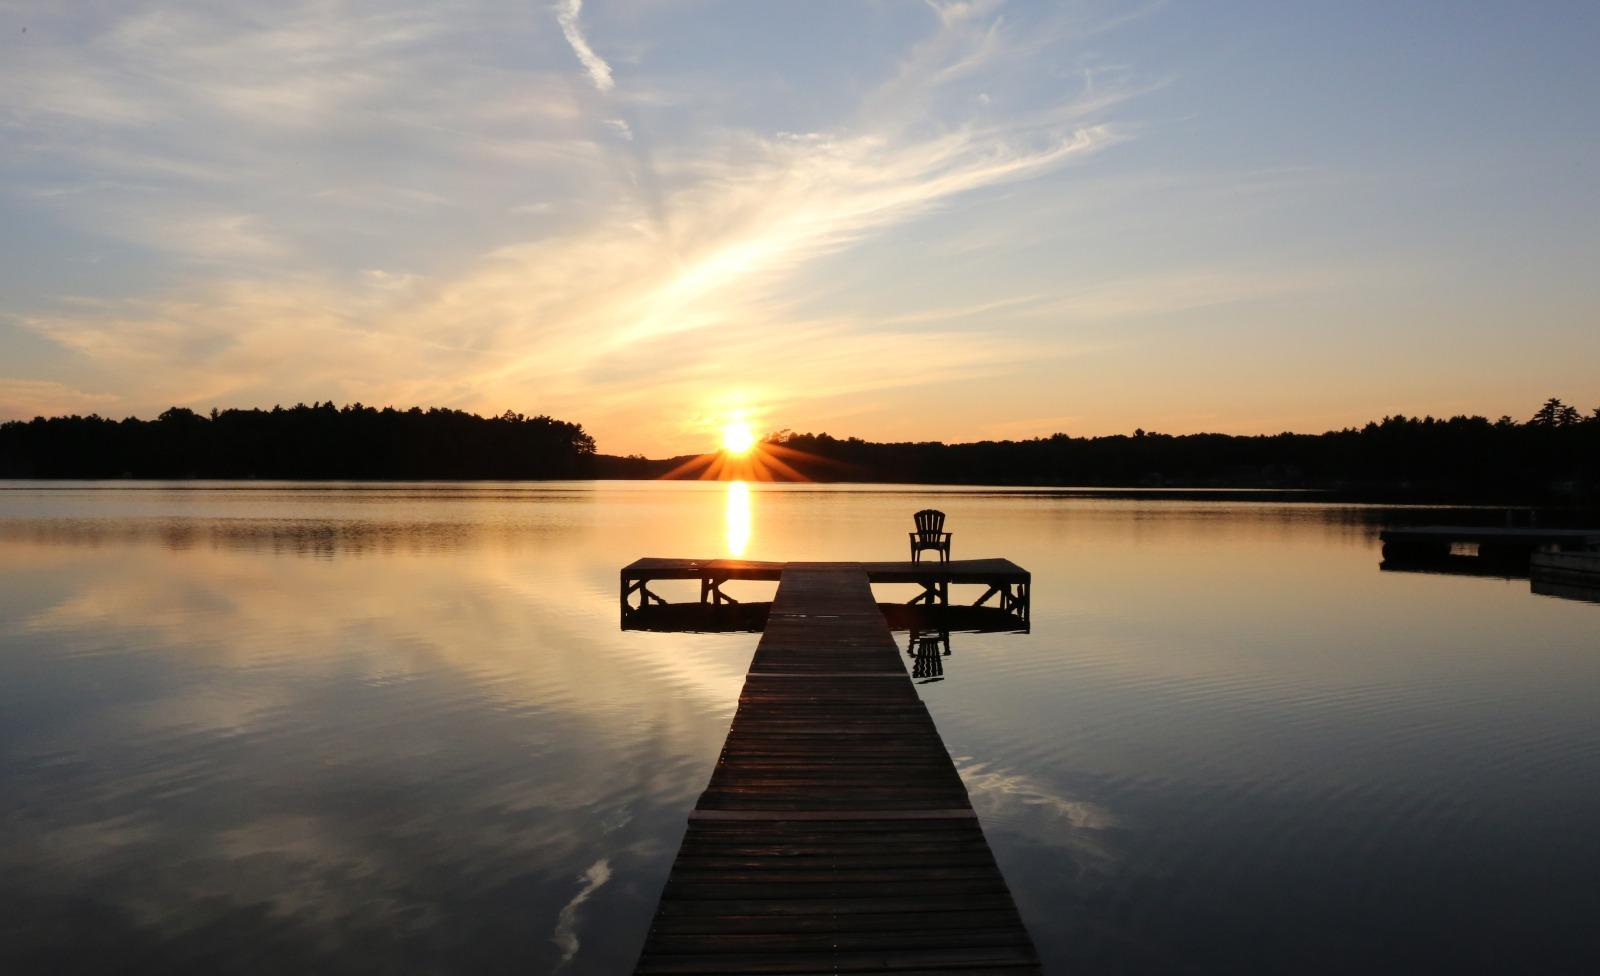 sunset lake thompson oneida county wisconsin